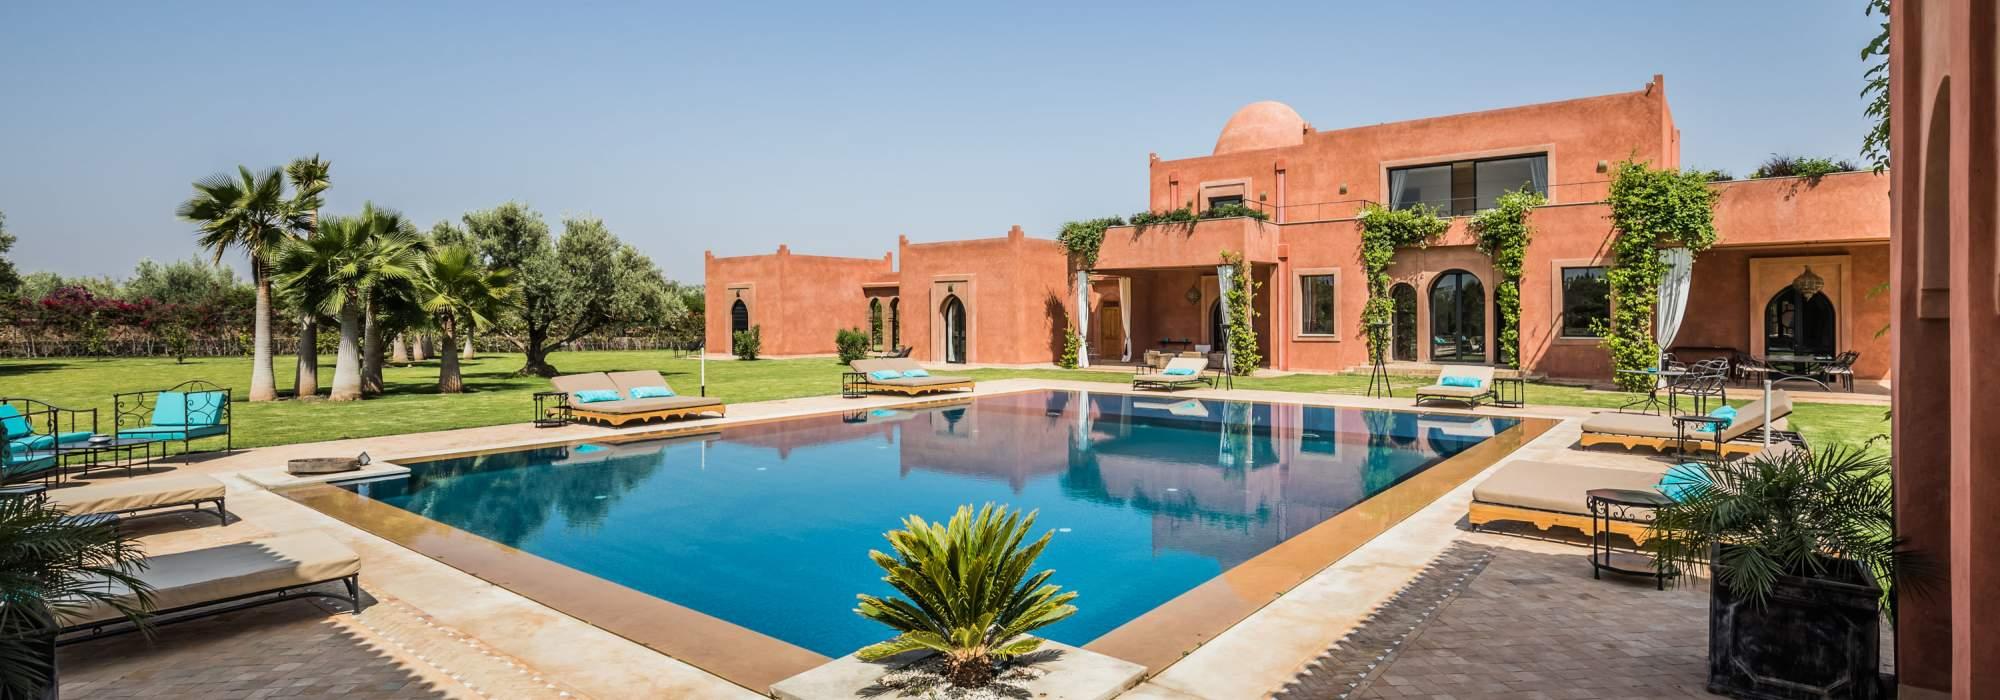 vente villa de prestige route de l'ourika marrakech